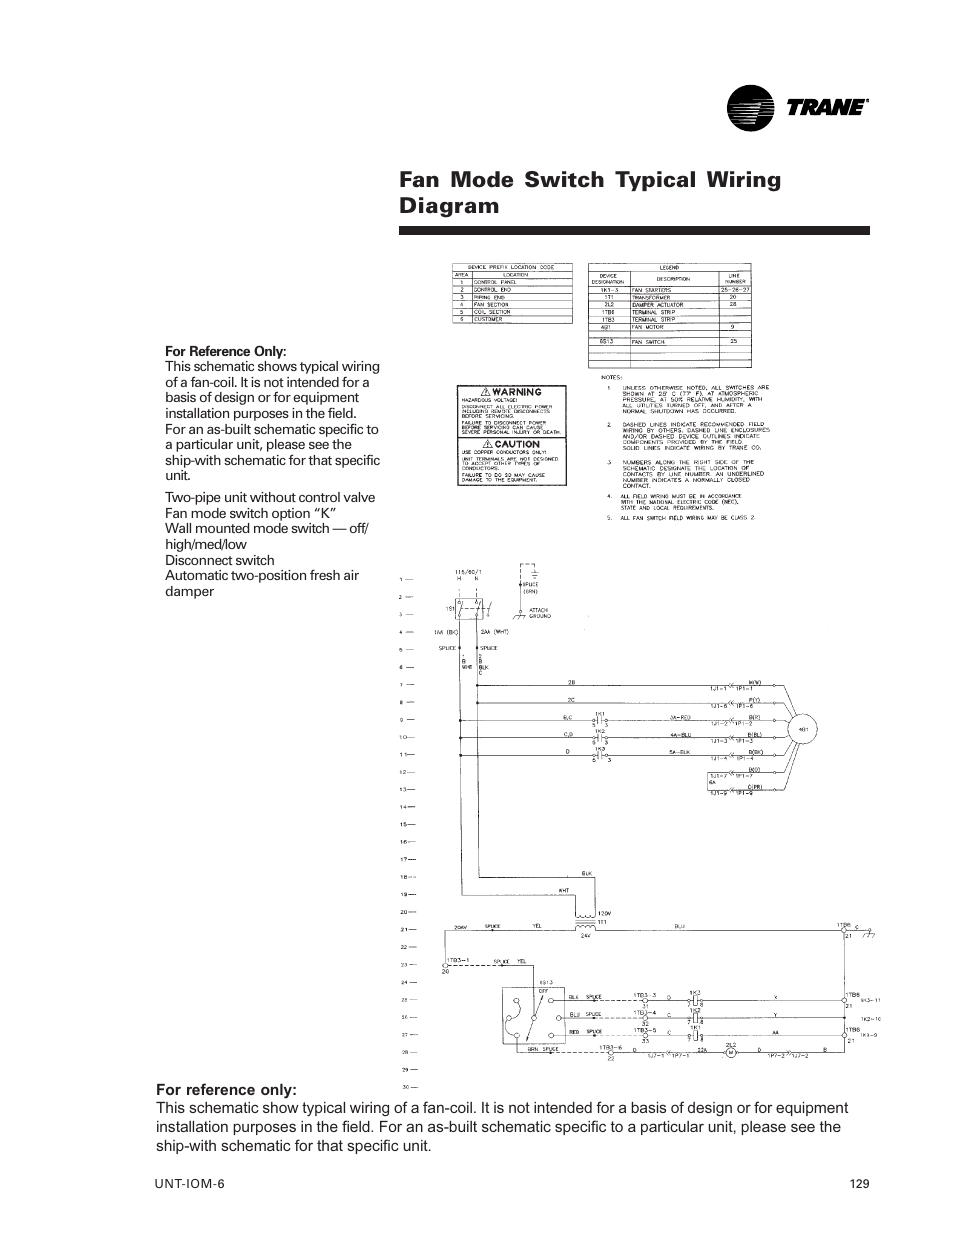 Trane Fan Coil Unit Wiring Diagram - Wiring Diagrams Place